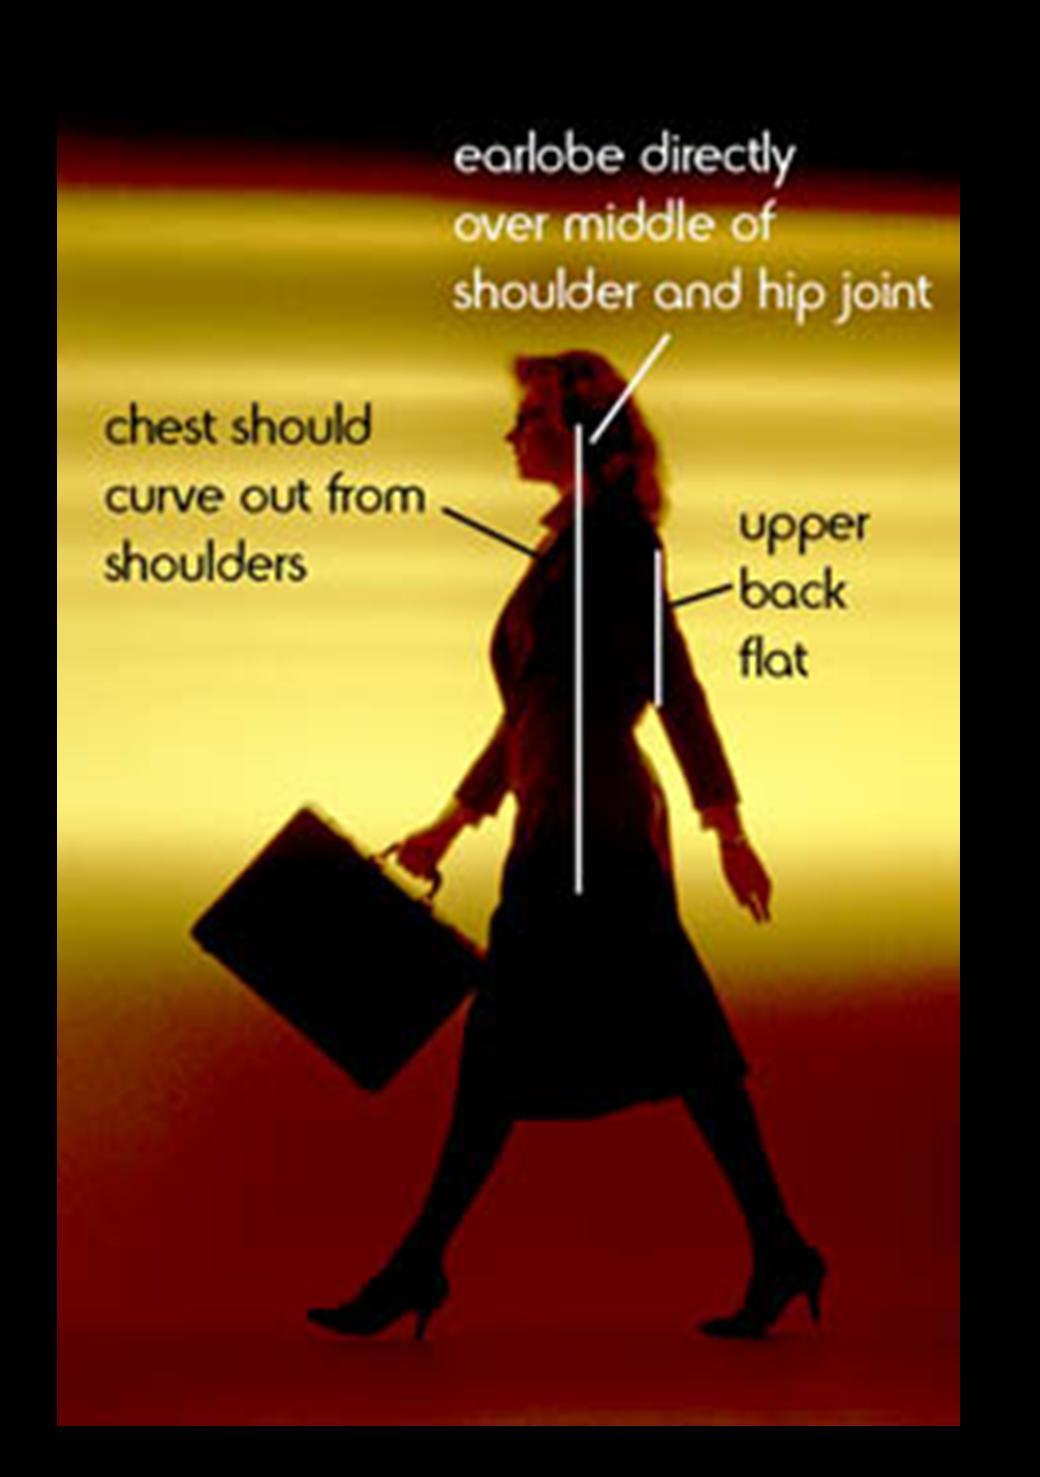 Posture Chair Benefits Office Stool Ergonomic Wellscript Llc 11 Great Of Having Good